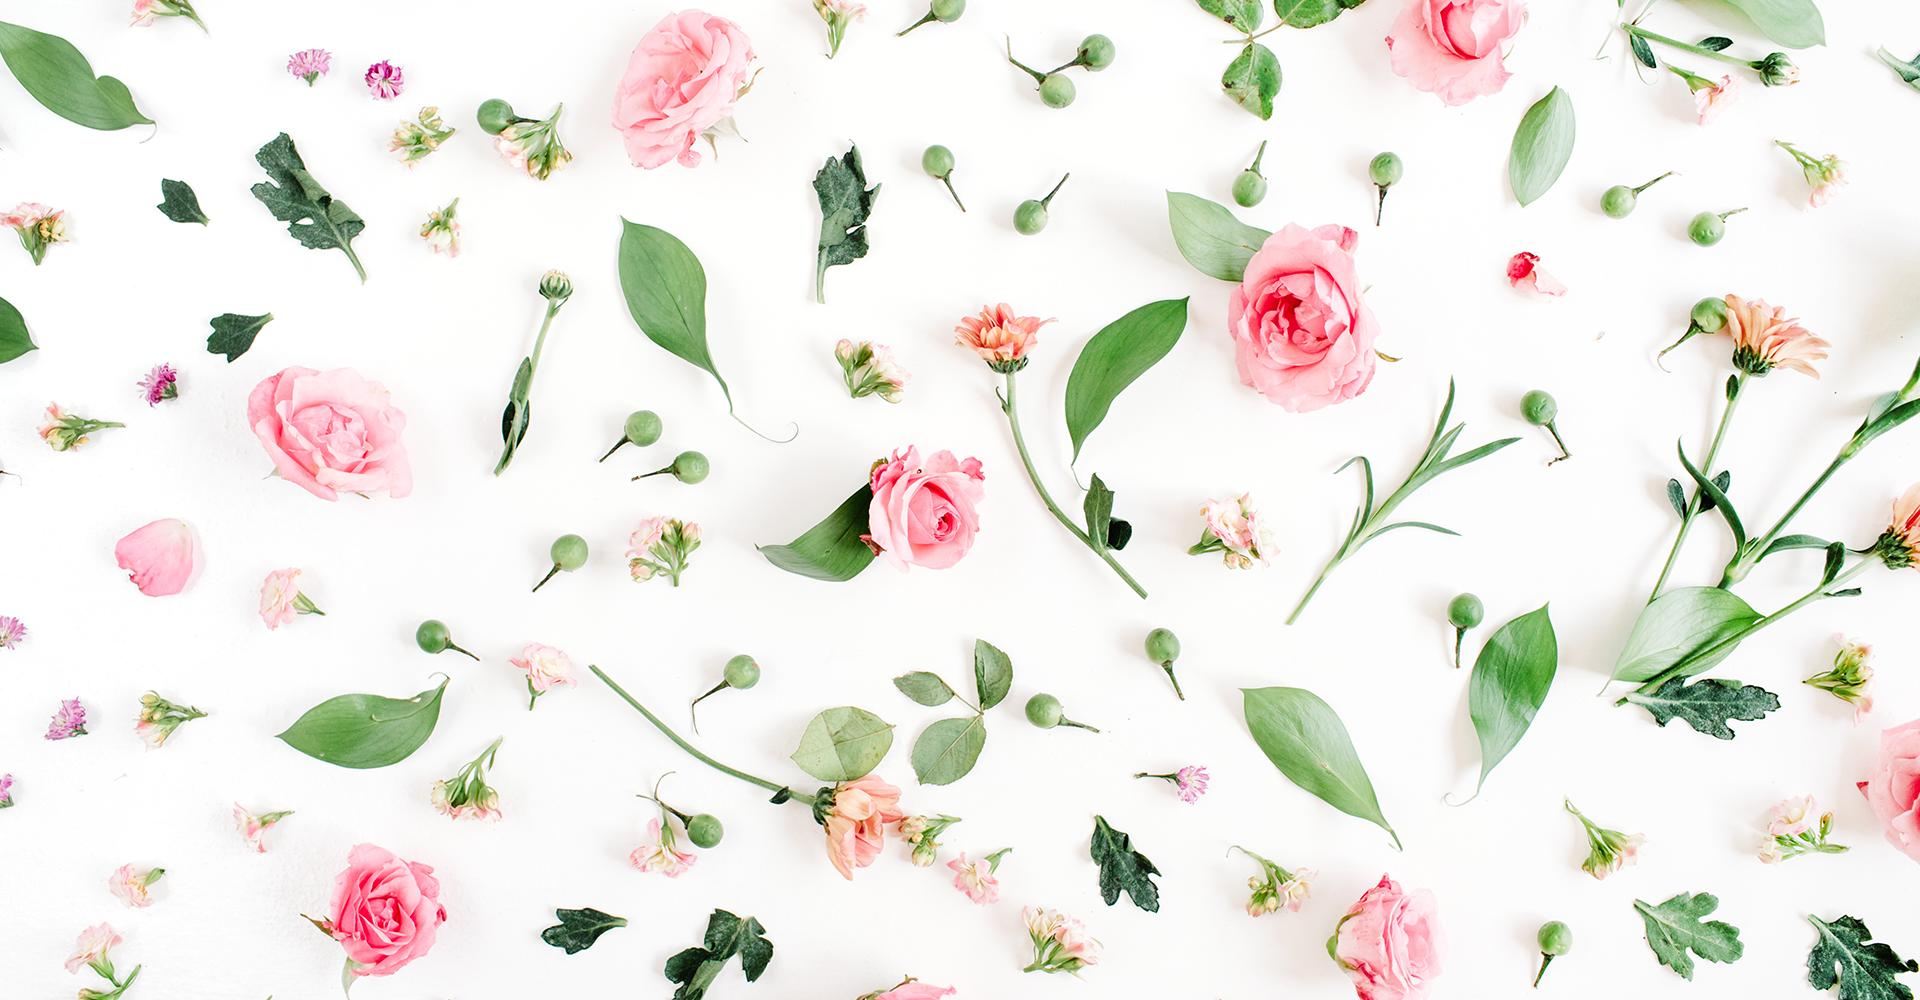 fun ways to reuse dried flowers